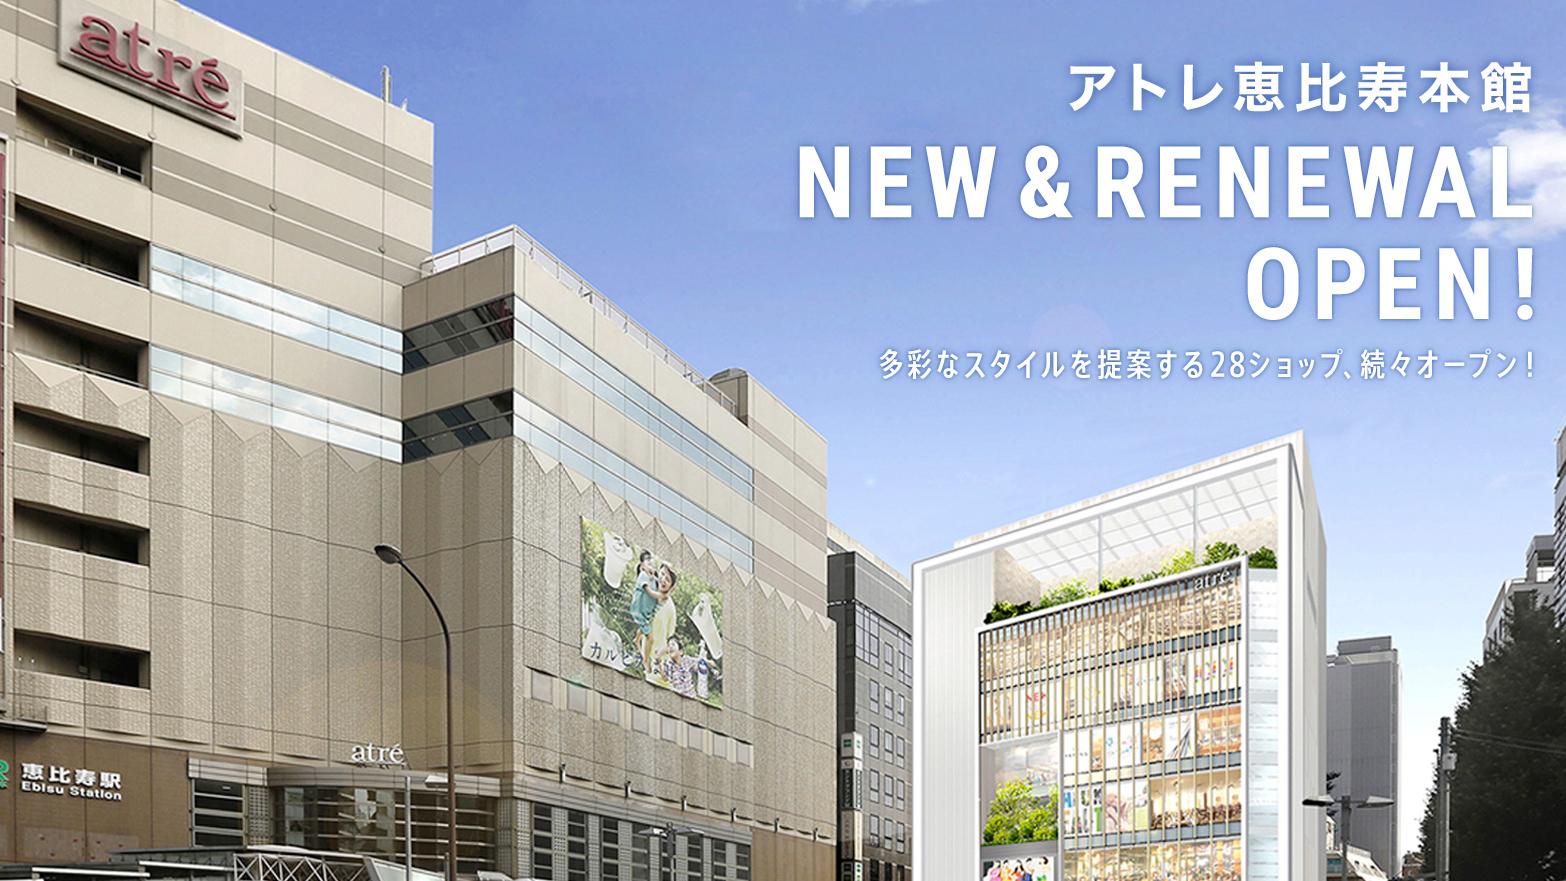 【東京新商場】アトレ恵比寿西館